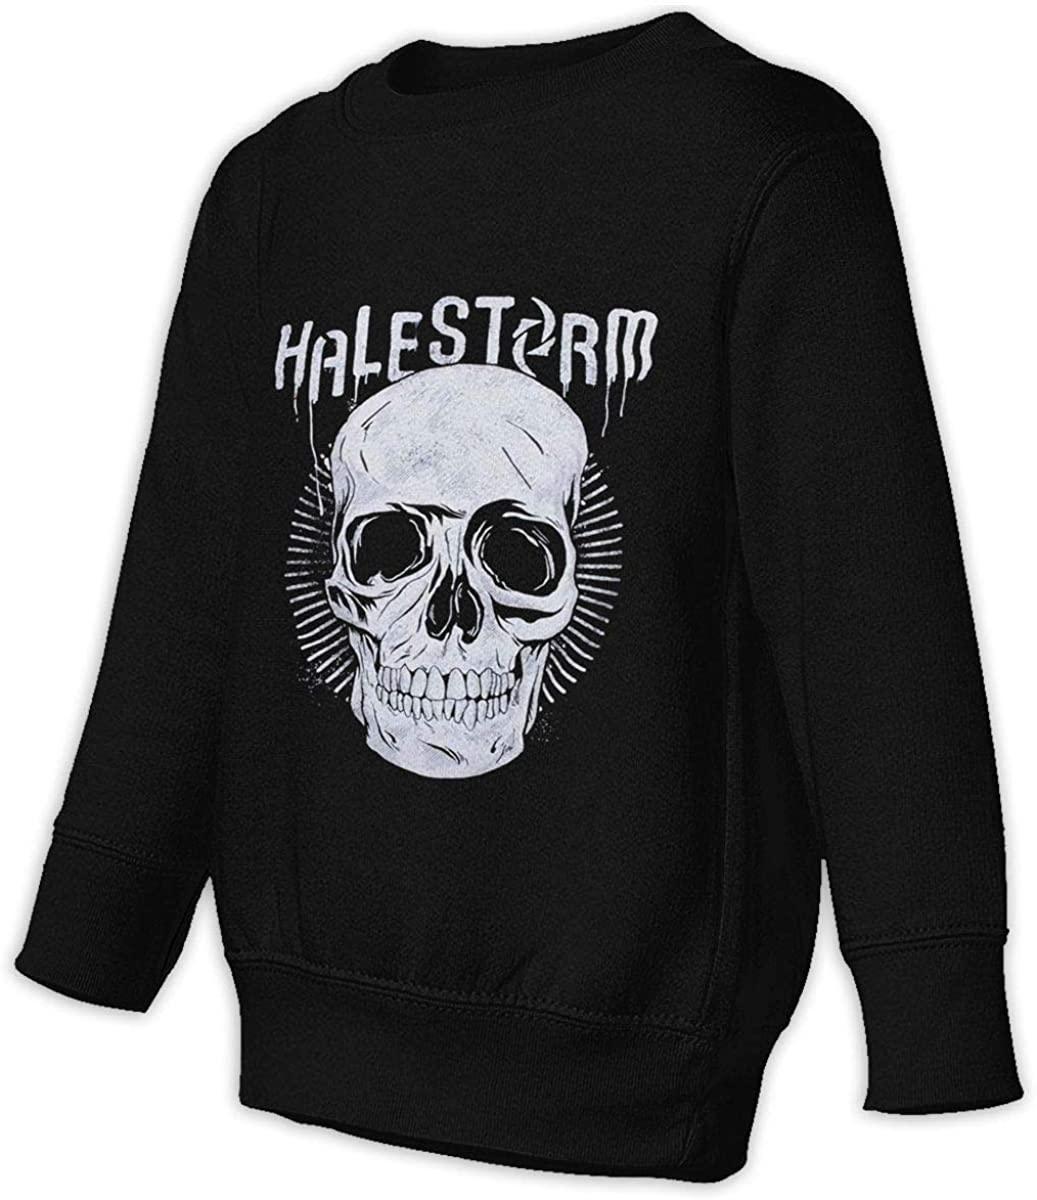 BodiGulick Hale-Storm Boys and Girls Sweatshirts, Cotton Sports Tops Sweatshirt Black